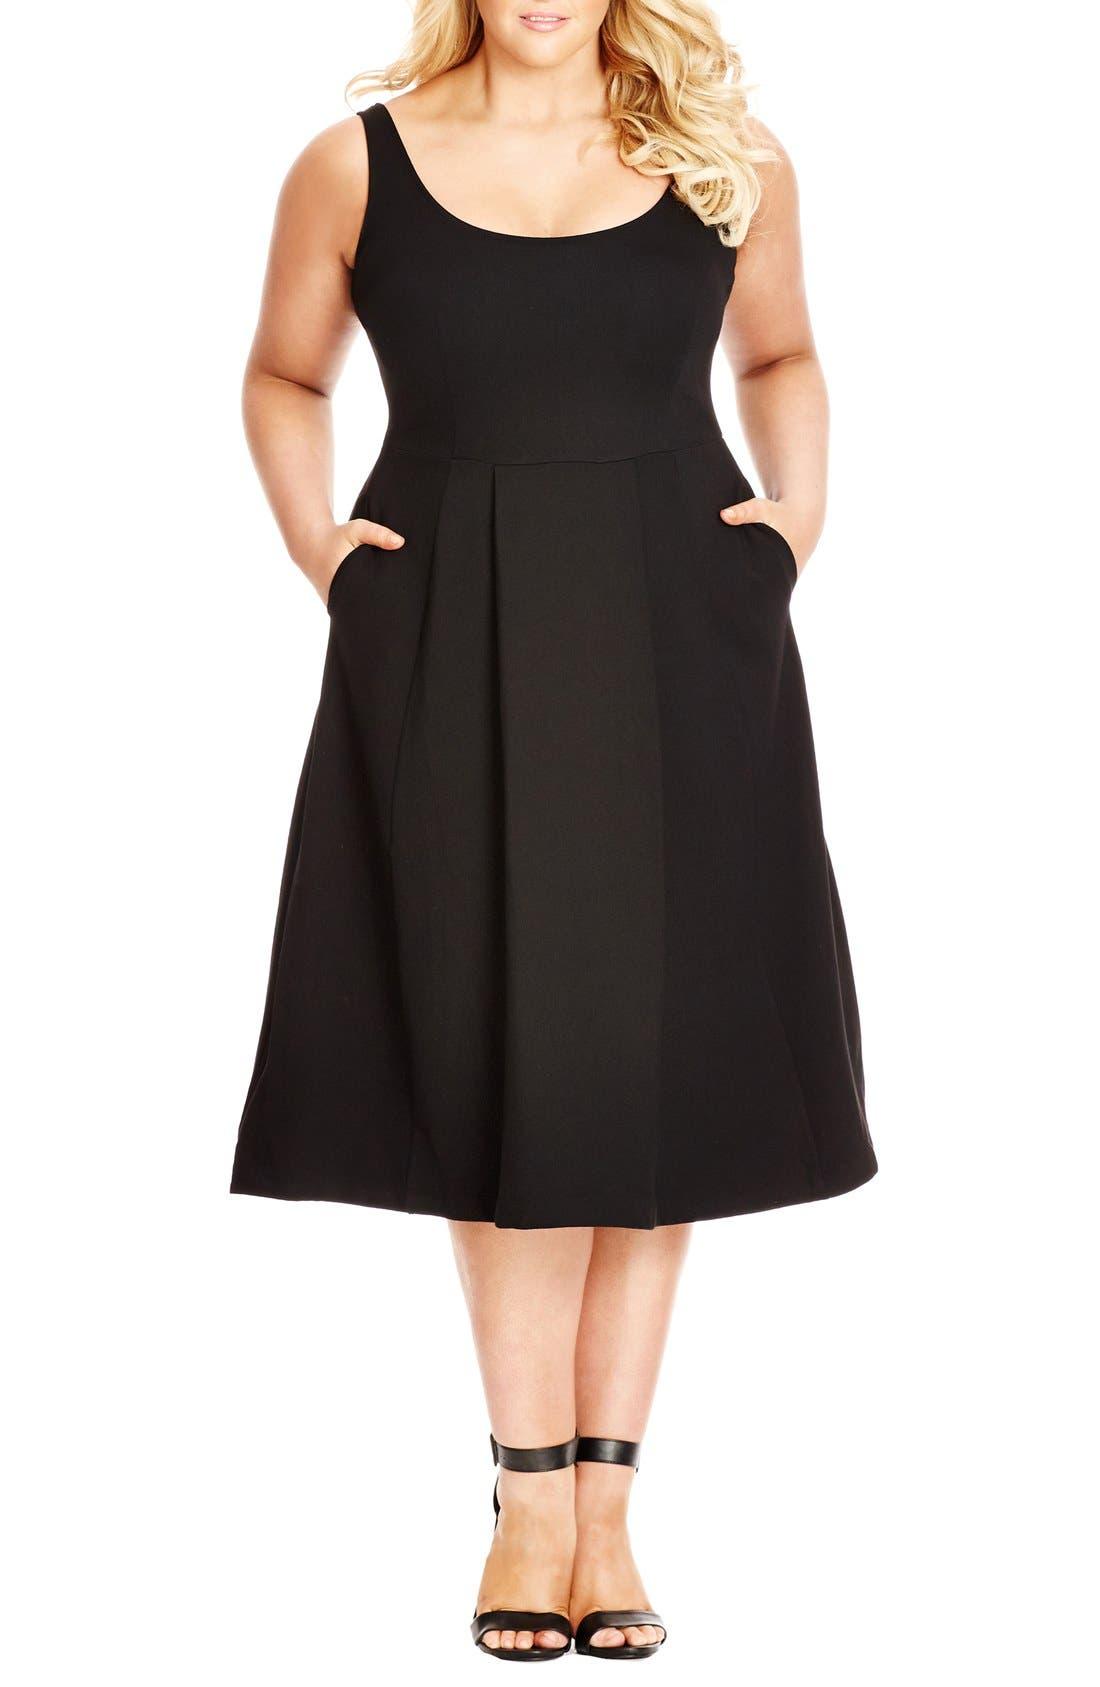 Alternate Image 1 Selected - City Chic Classic Longline Scoop Neck Midi Dress (Plus Size)